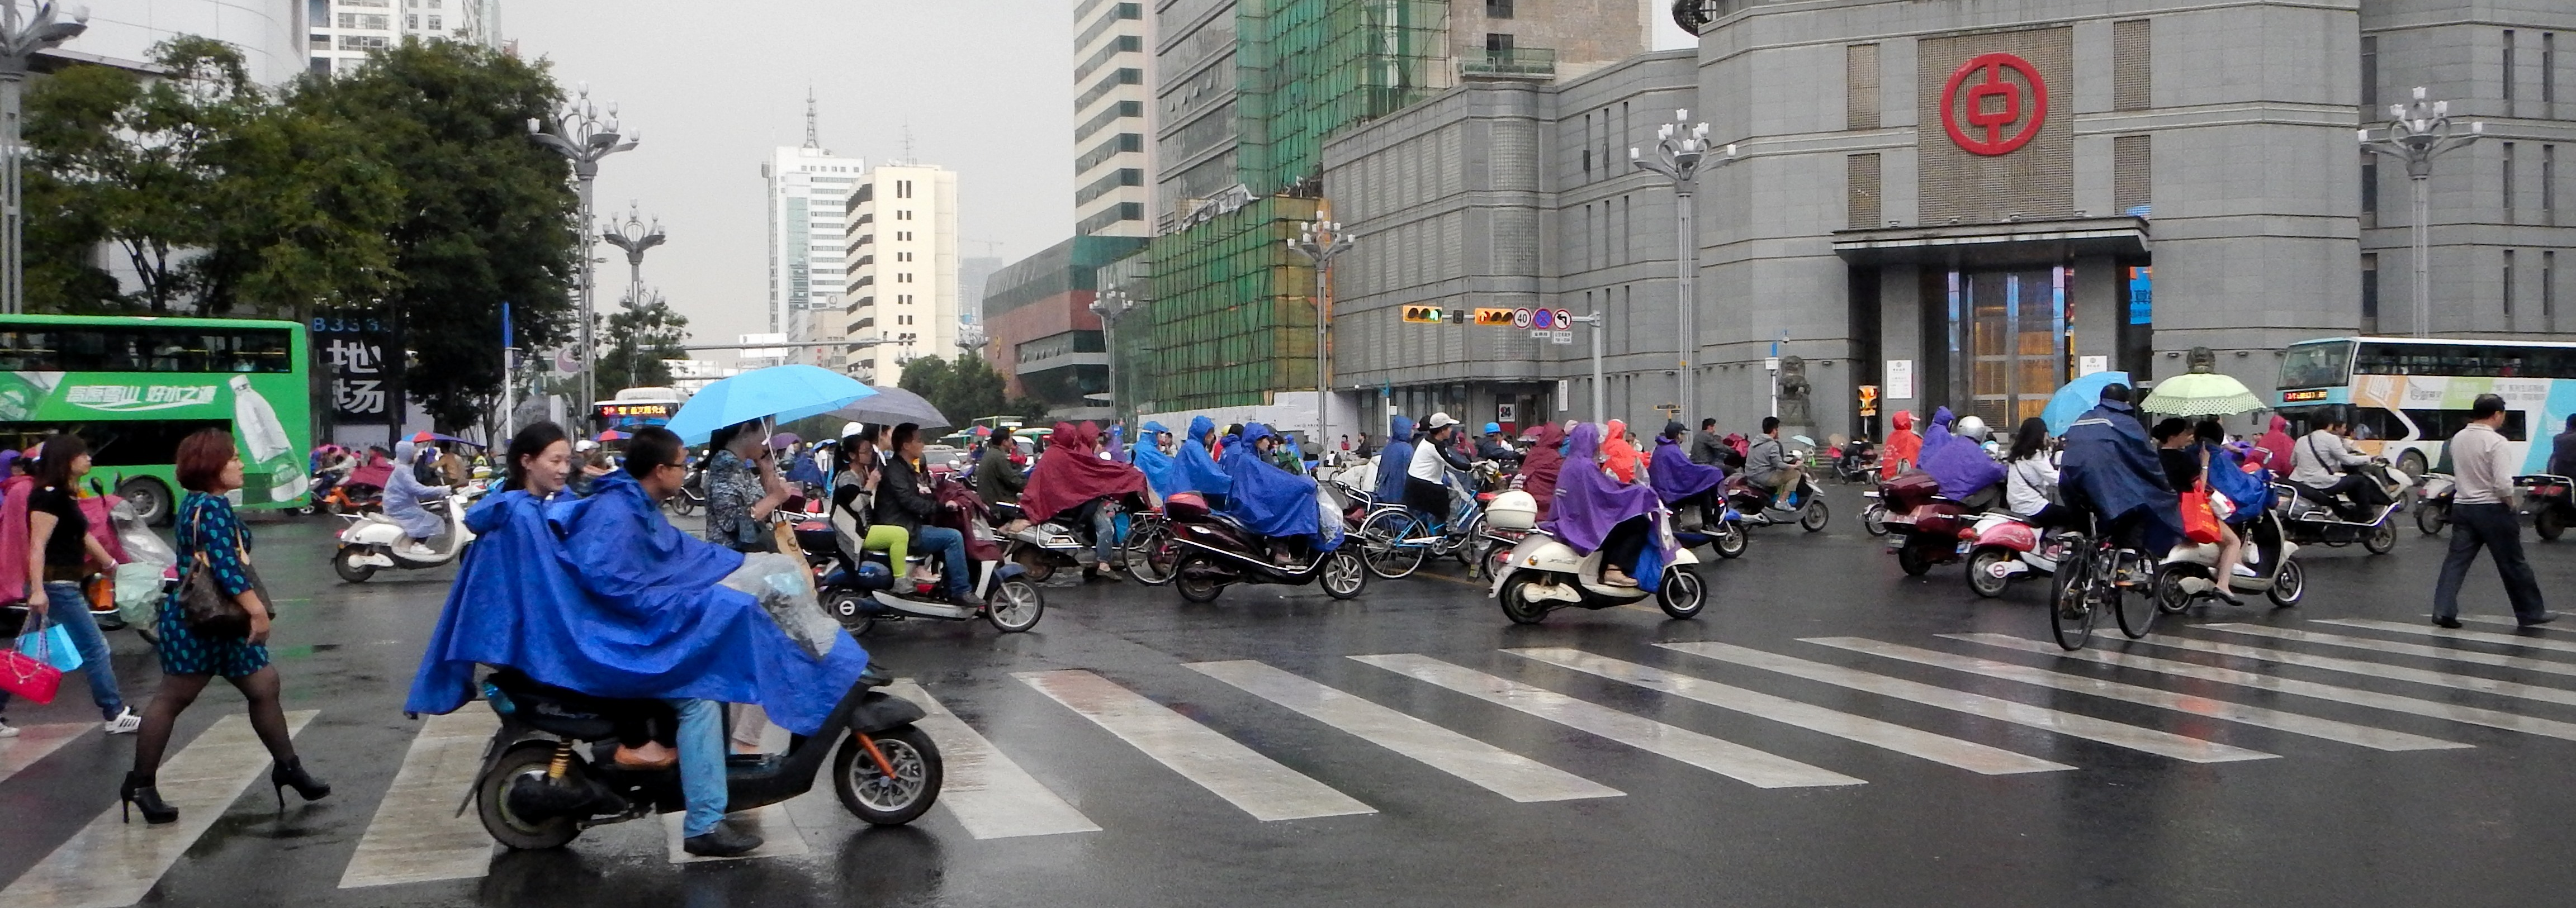 21 Kunming 219 Pel centre 59